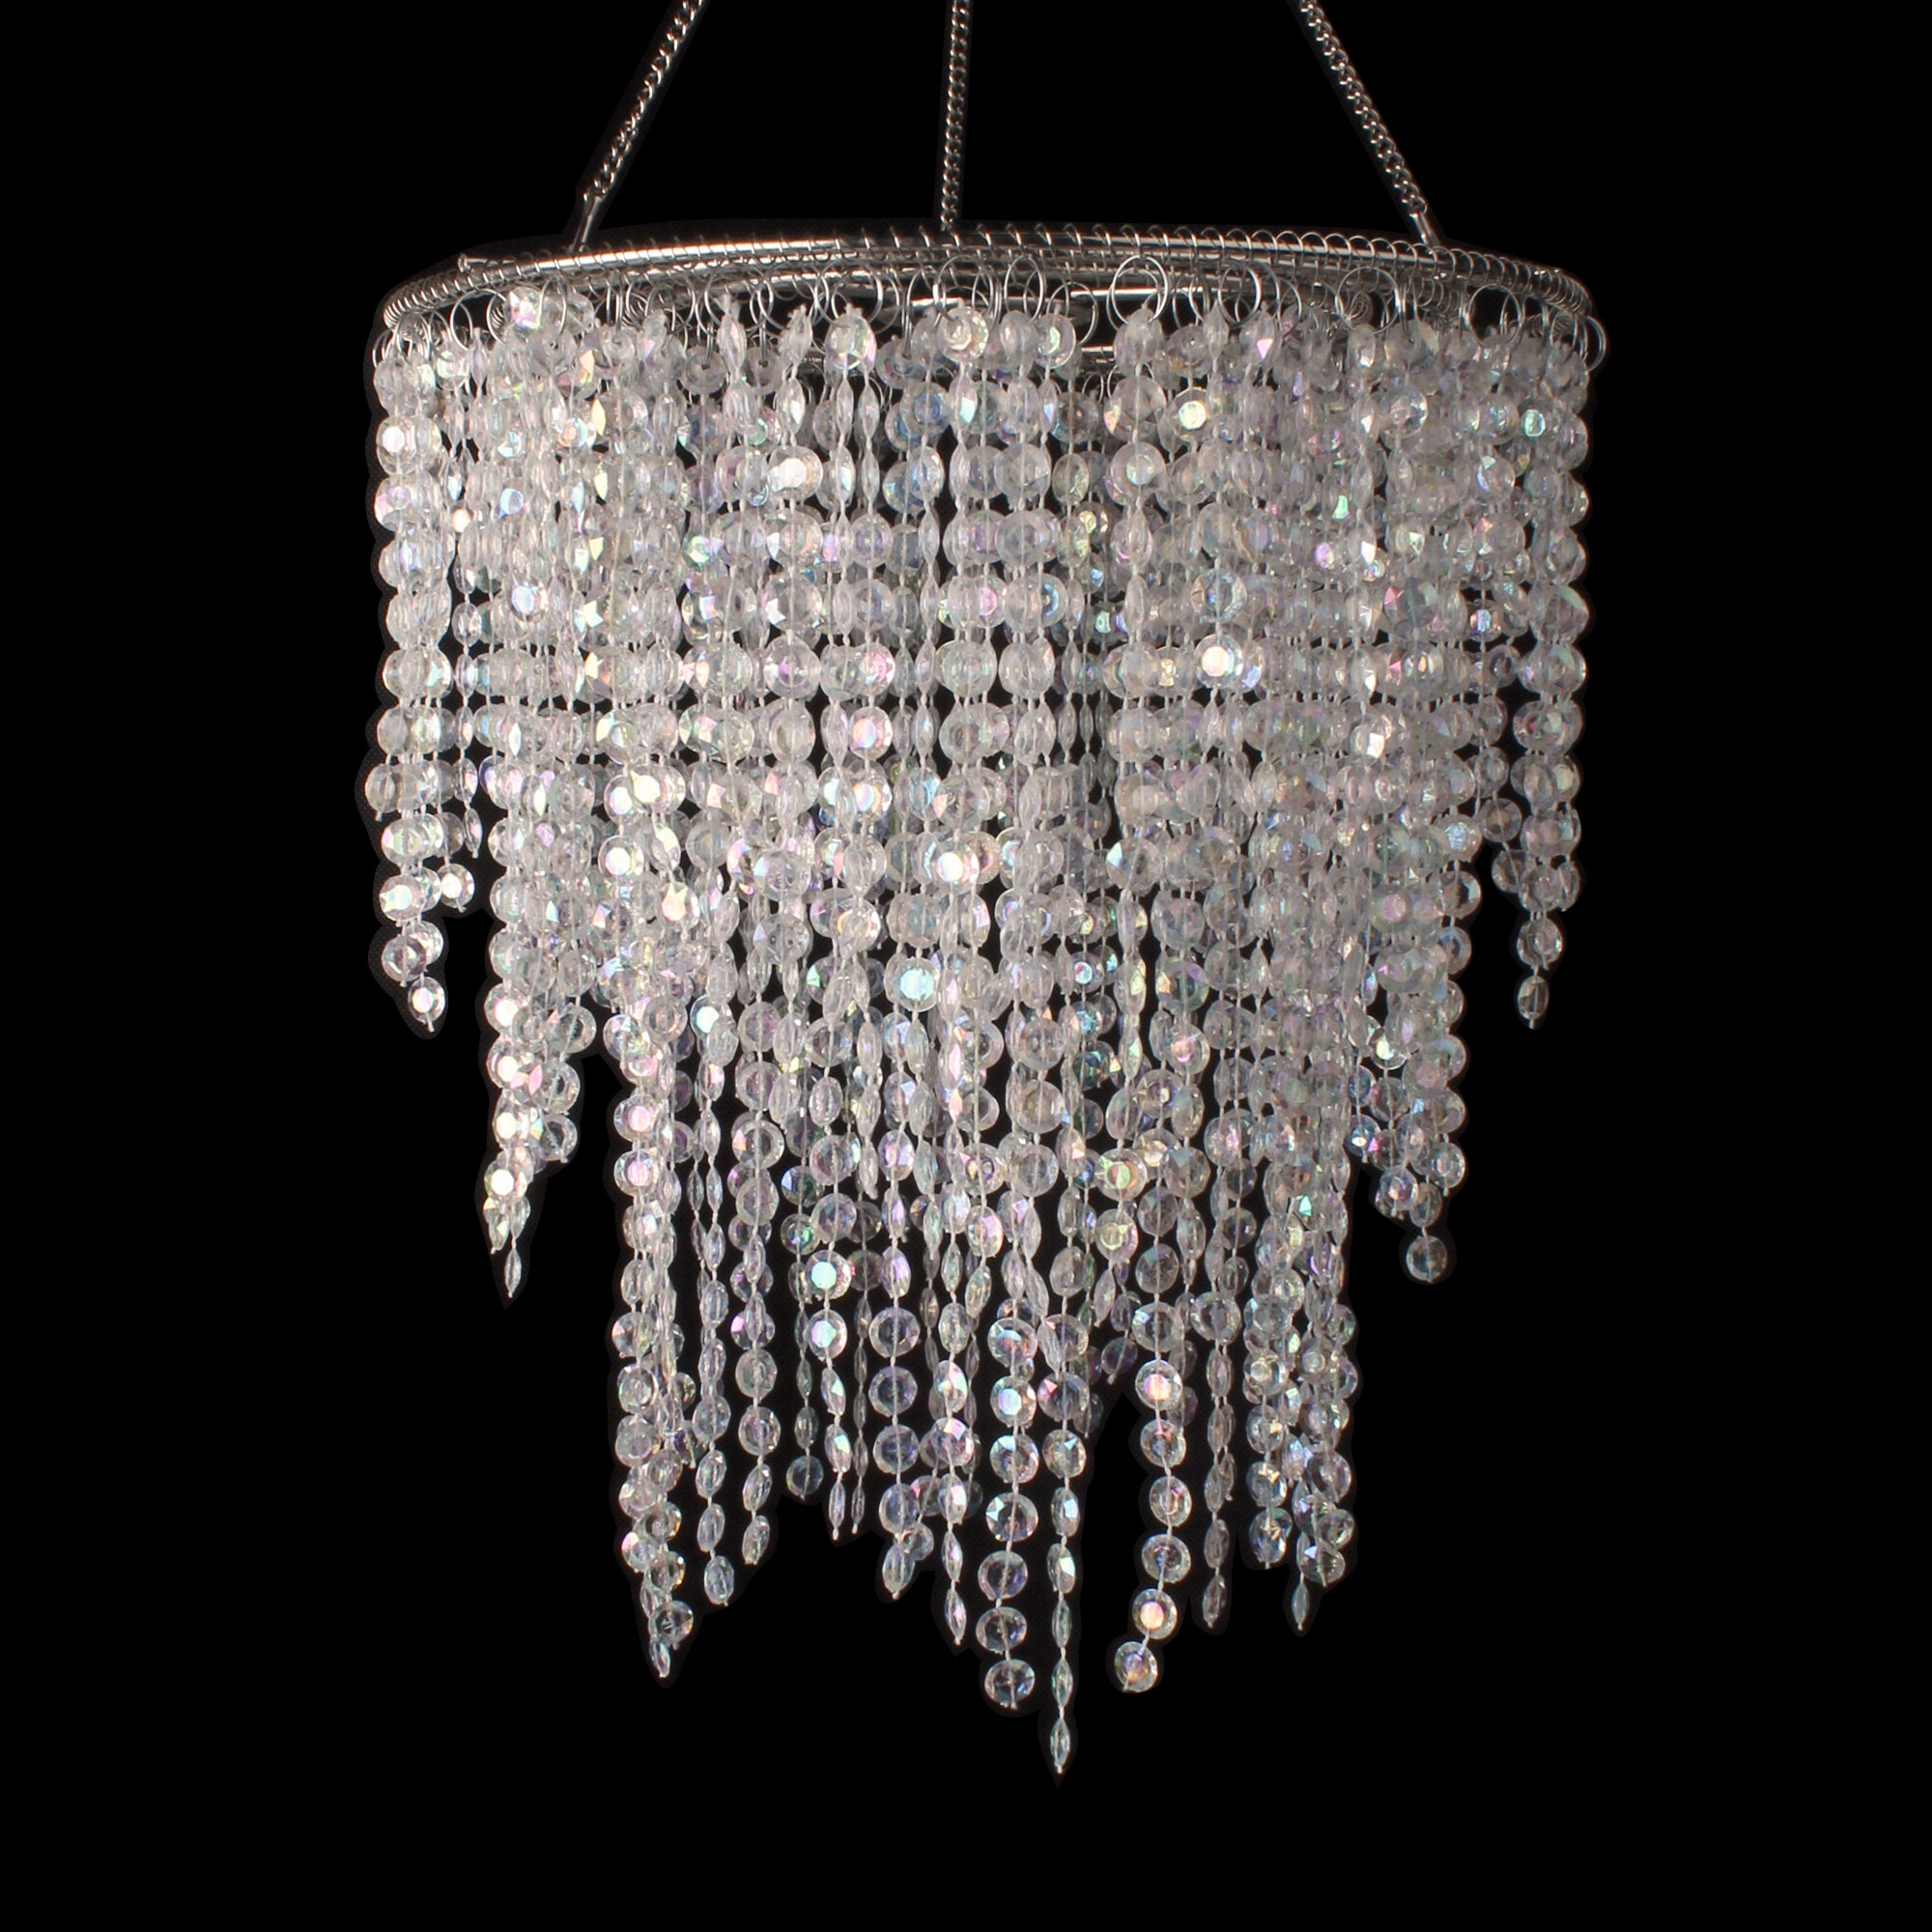 Bingen 3 layered crystal iridescent diamond cut crystal chandelier